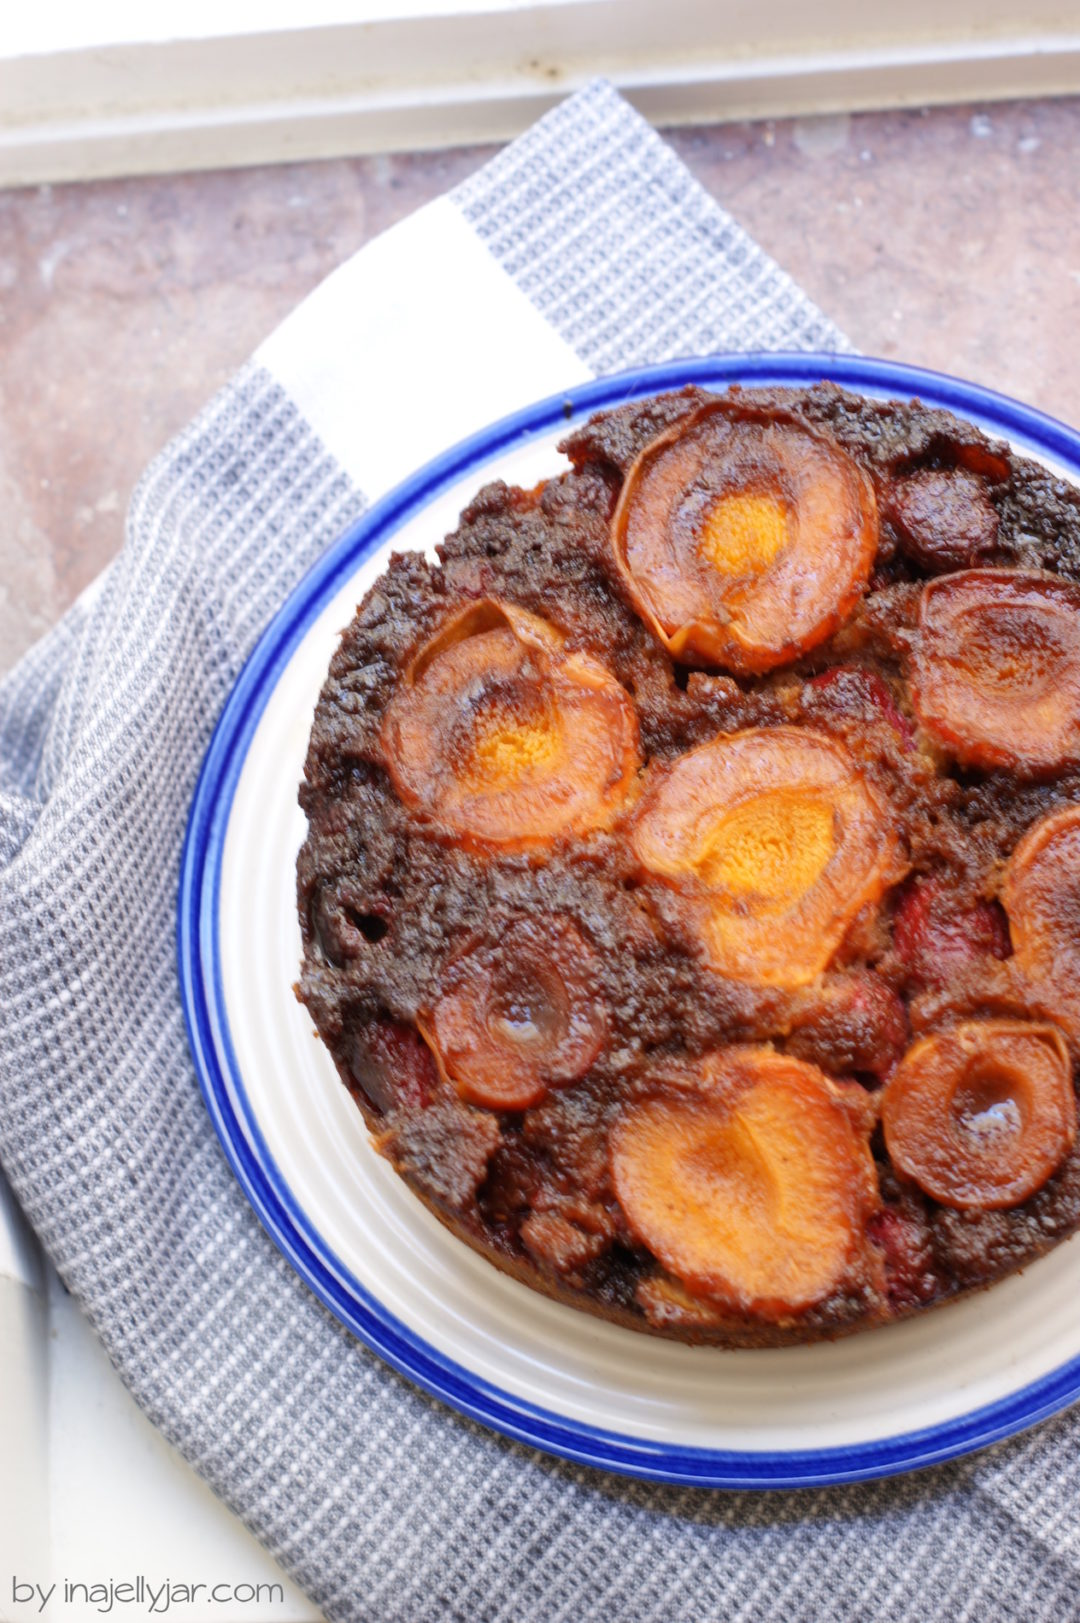 Marillenkuchen mit Himbeeren - Upside-Down-Variante